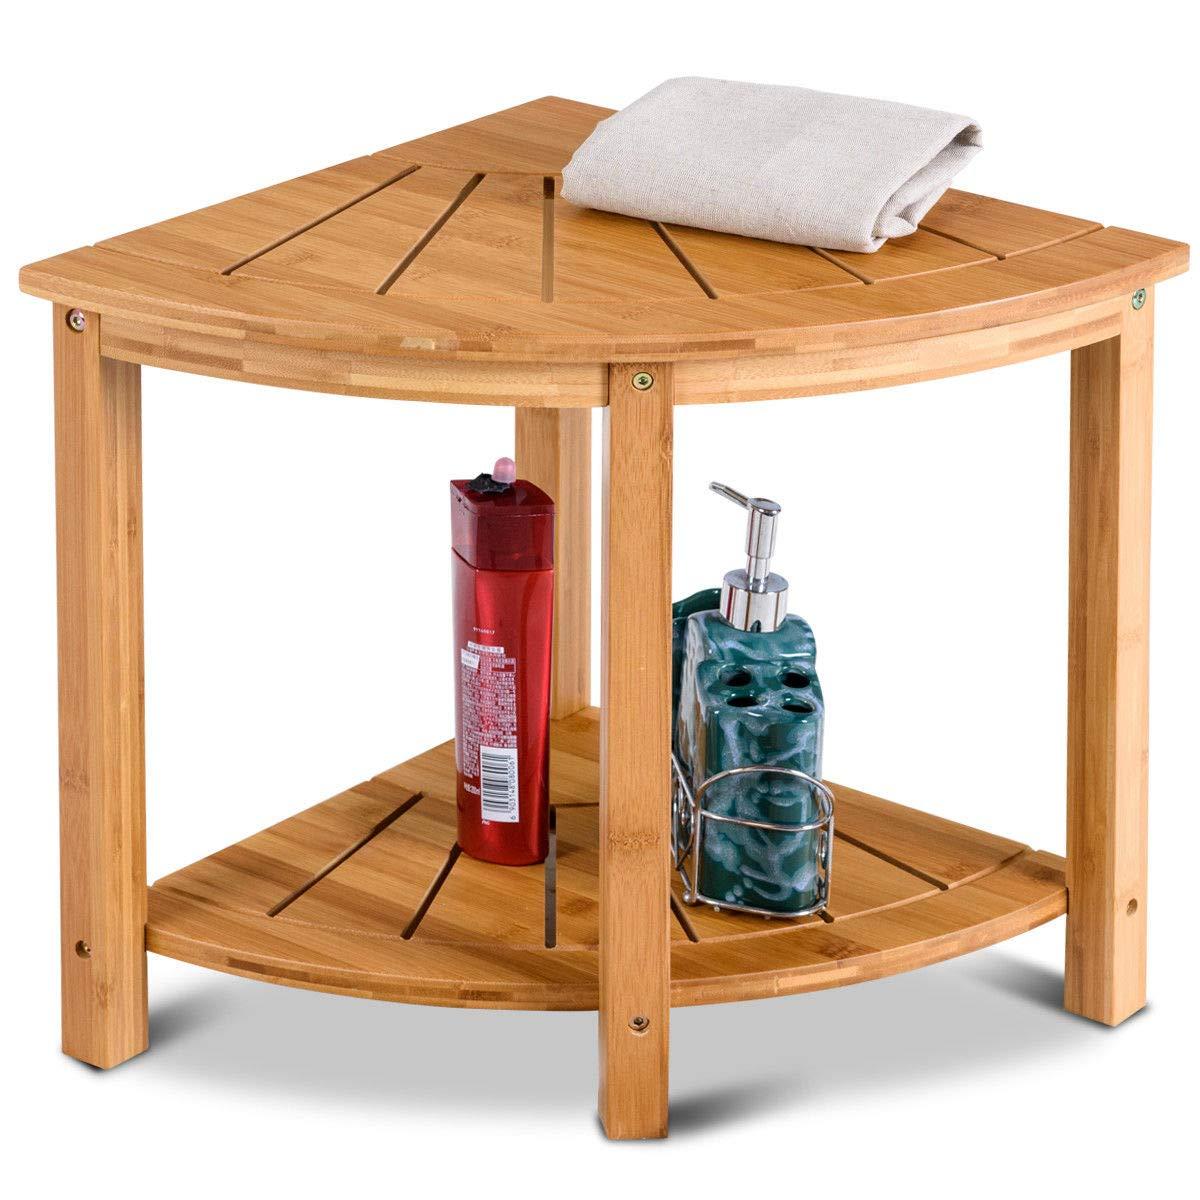 Shower Beach Bamboo Spa Seat Stool Bathroom Organizer with Storage Shelf Corner